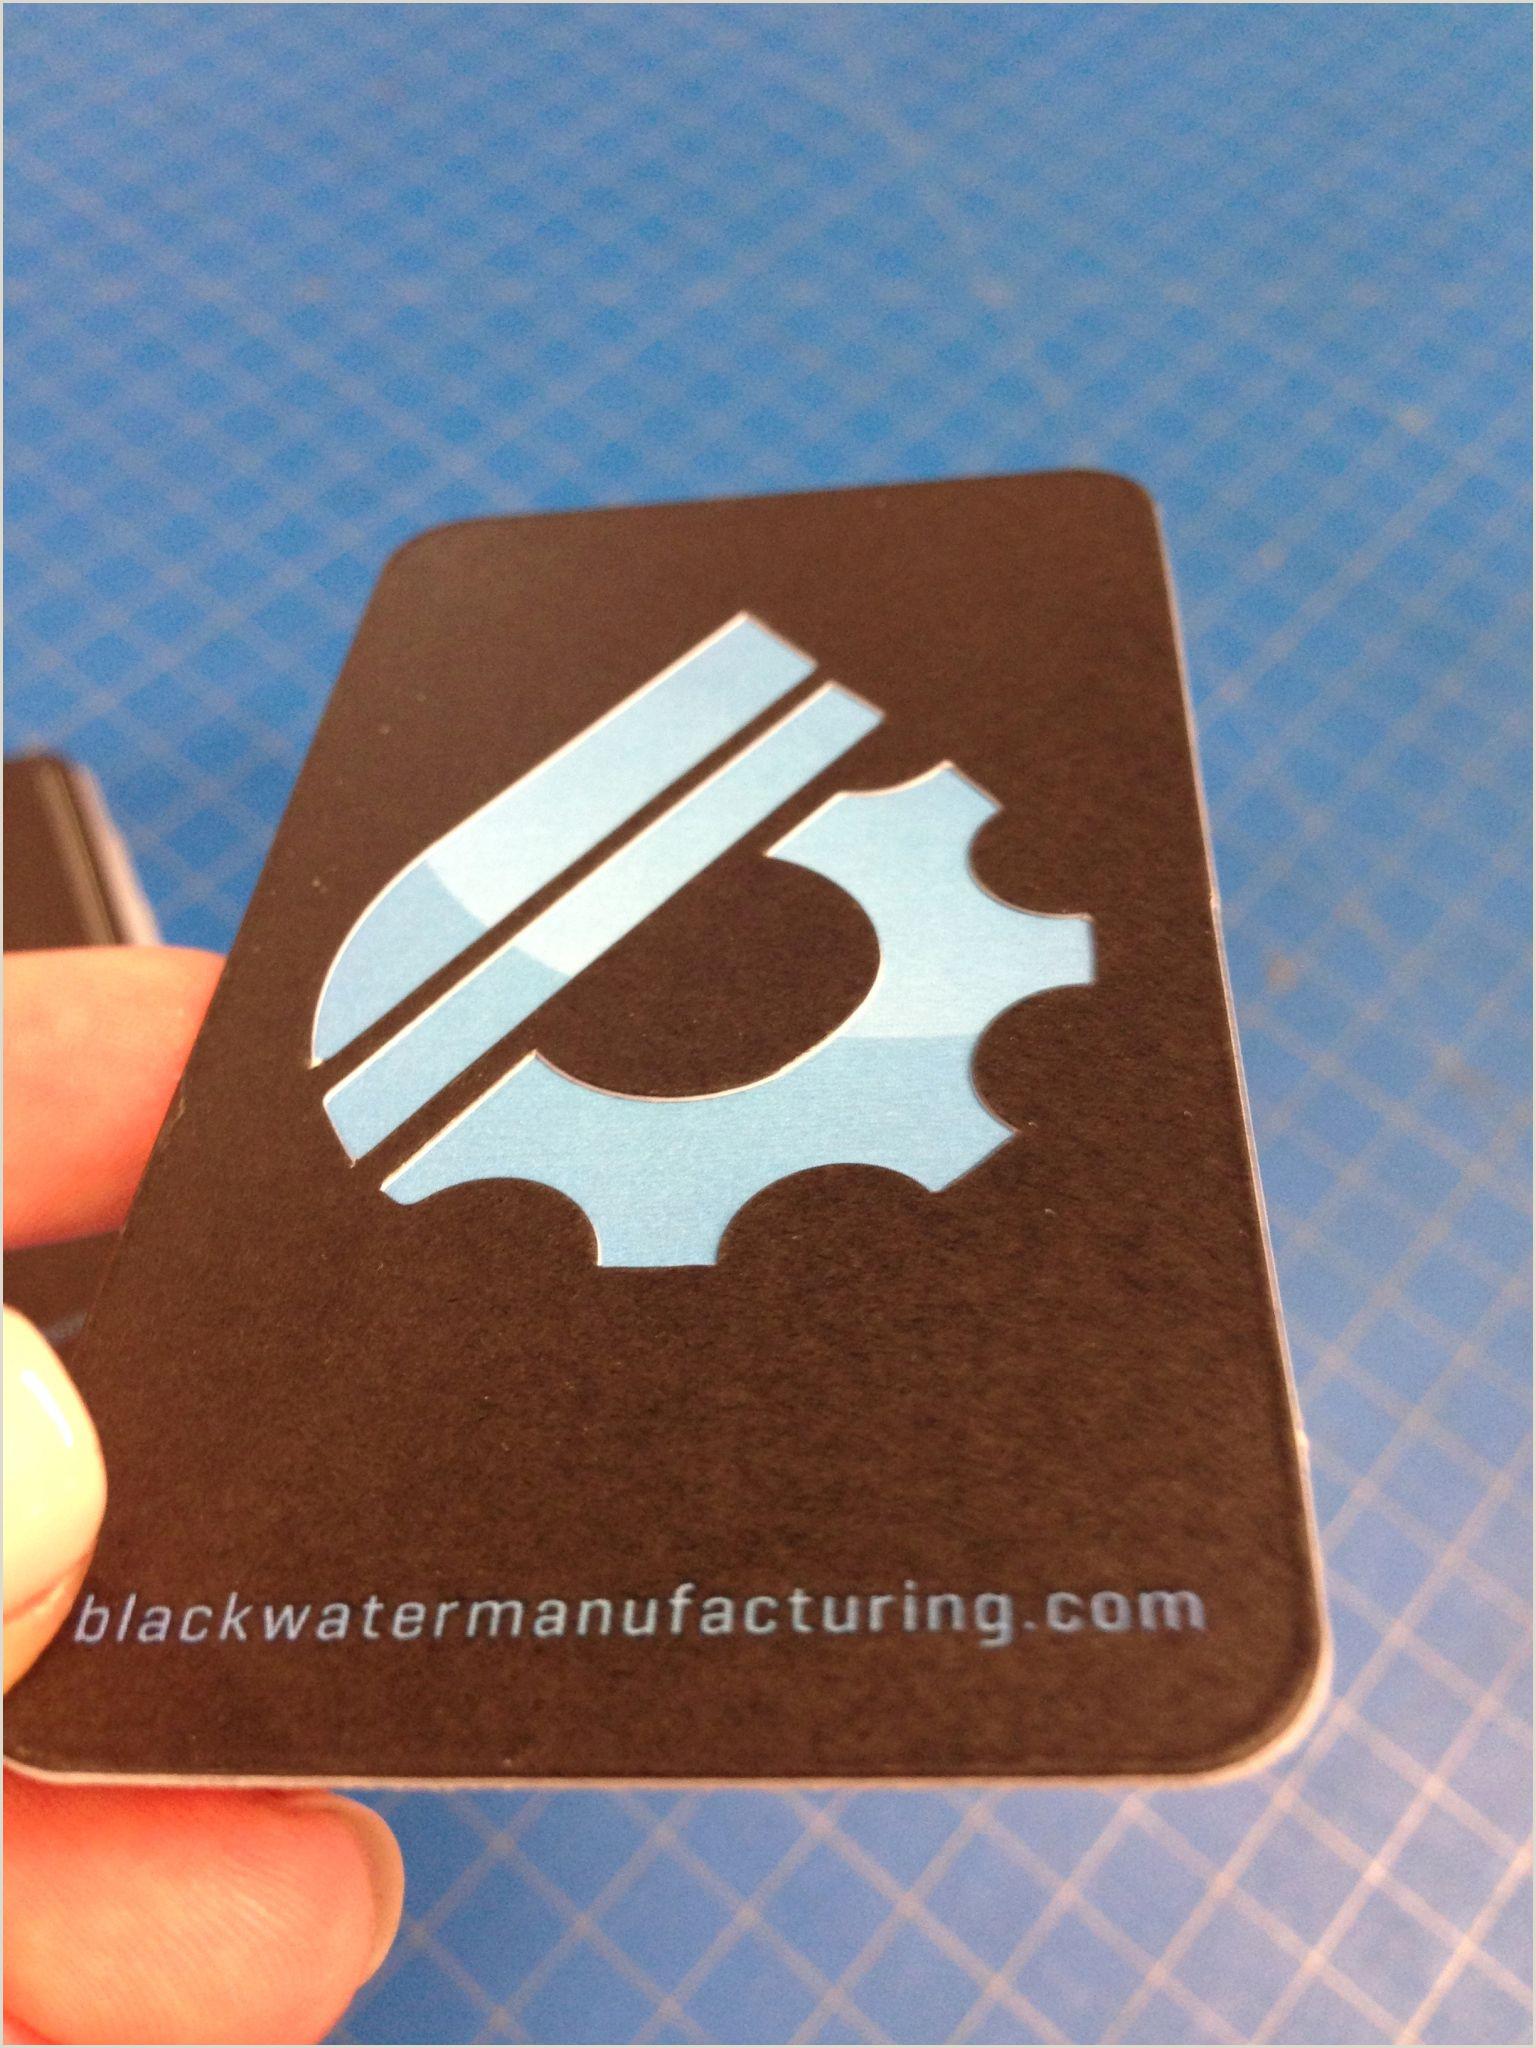 Best Business Cards For Rewards Eyelash Business Cards Templates